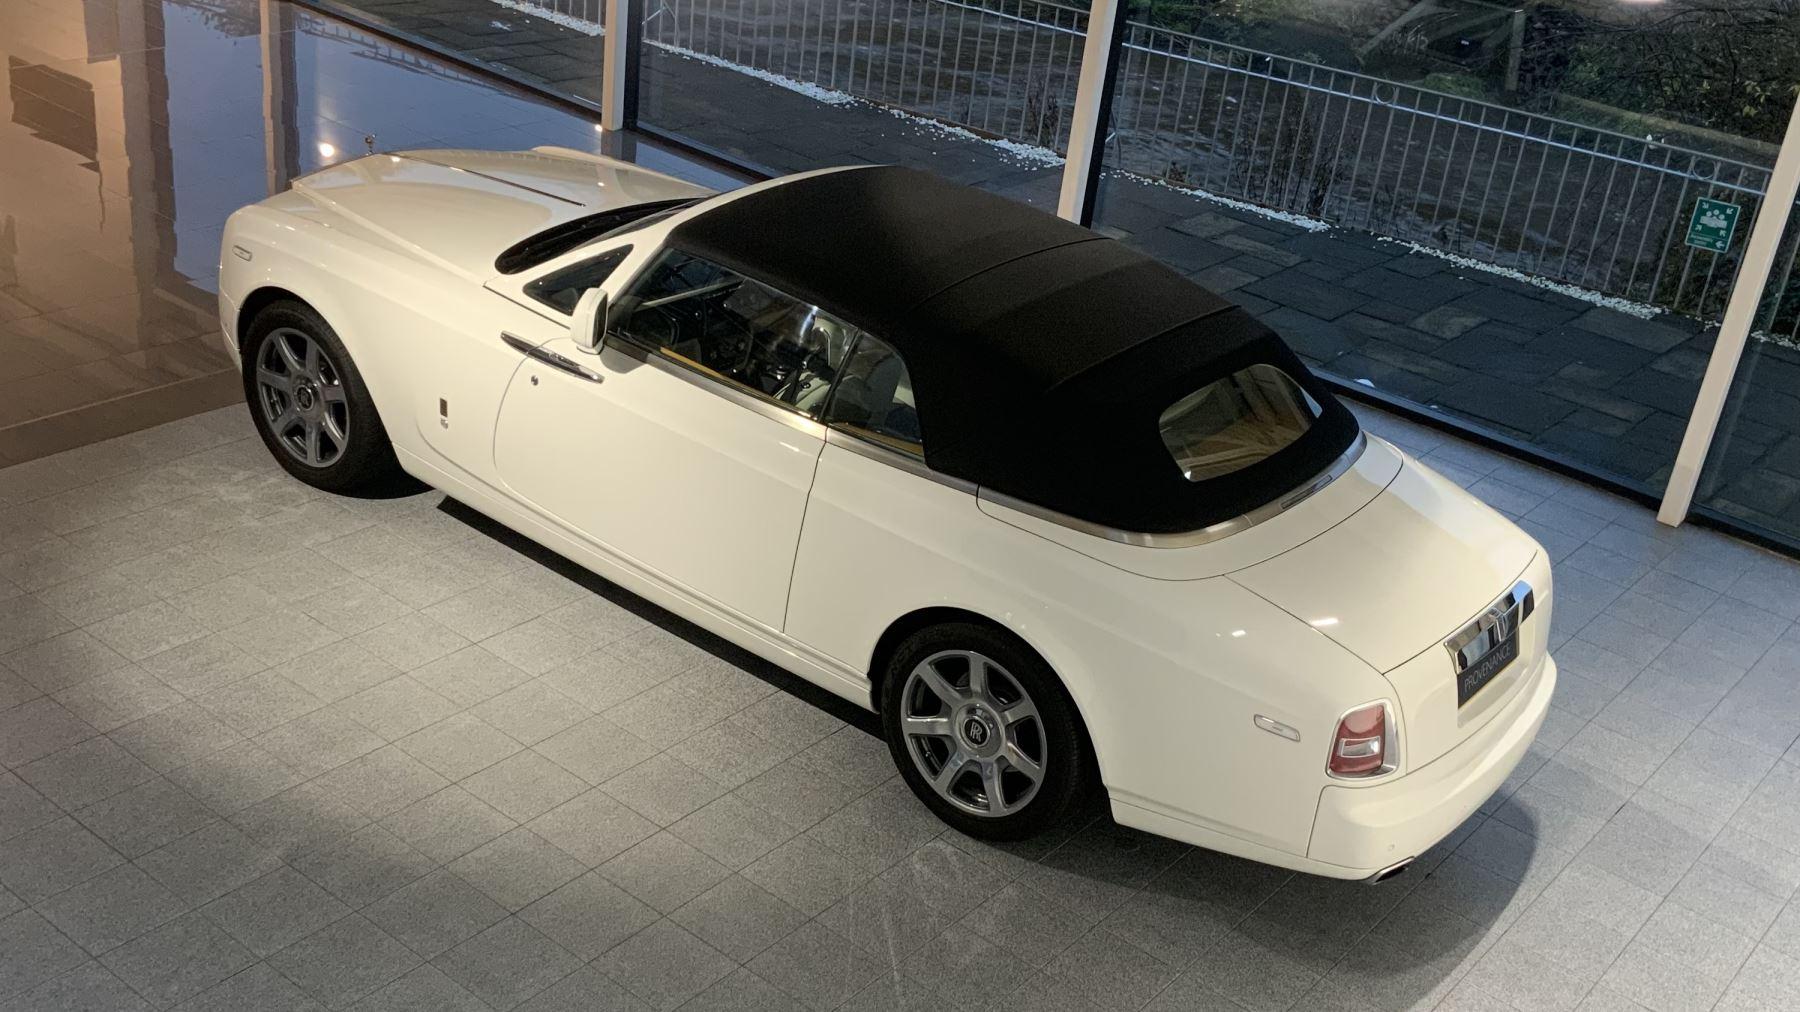 Rolls-Royce Phantom Drophead Coupe Series 2 image 16